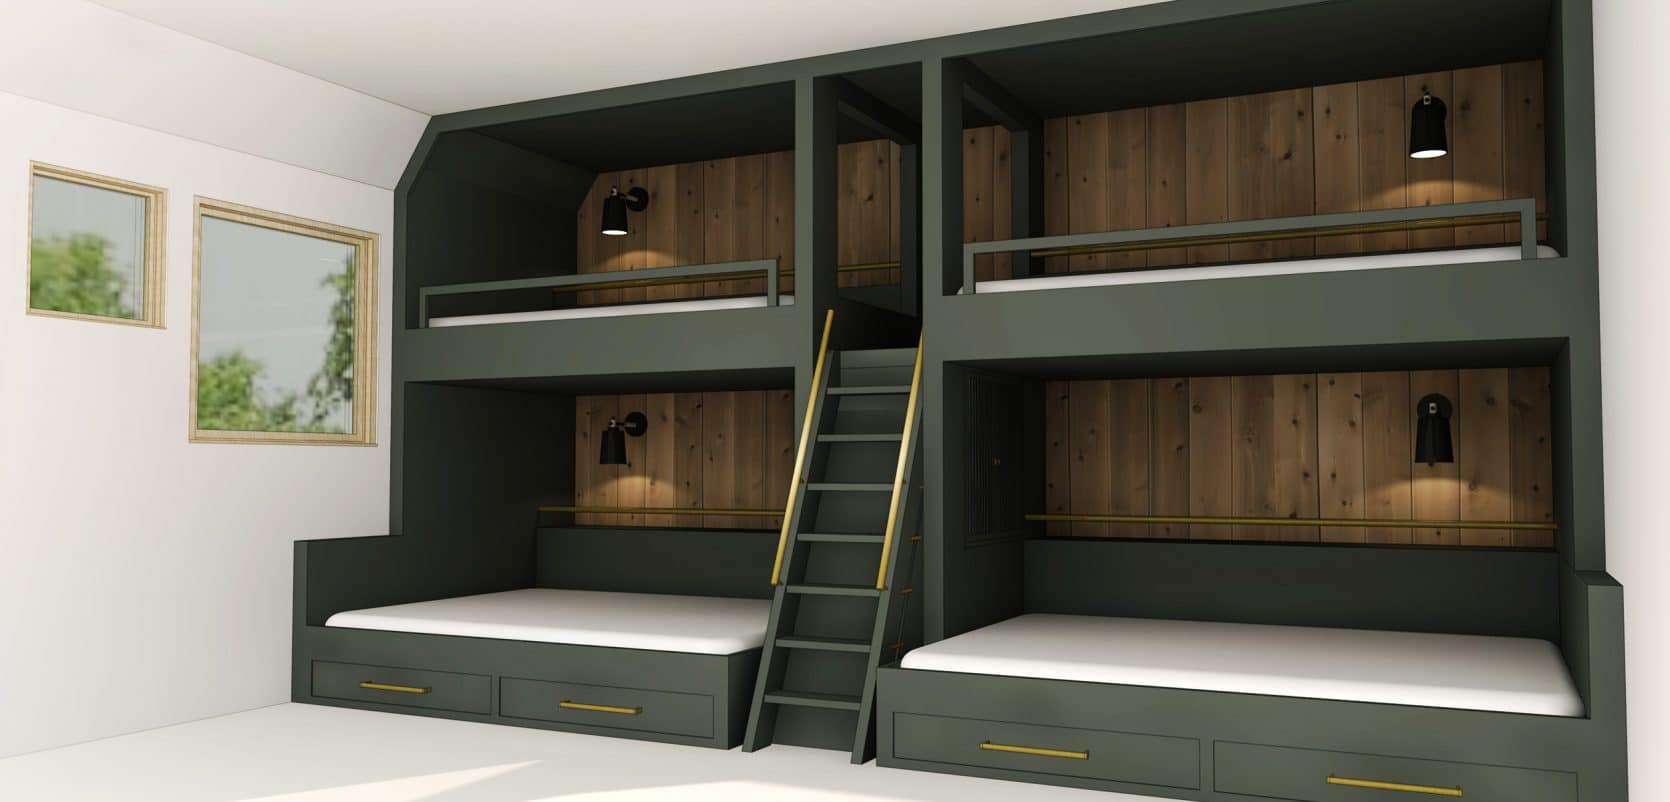 Emily Henderson Mountain Fixer Upper Second Level Kids Bunk Room Bunk Beds 03